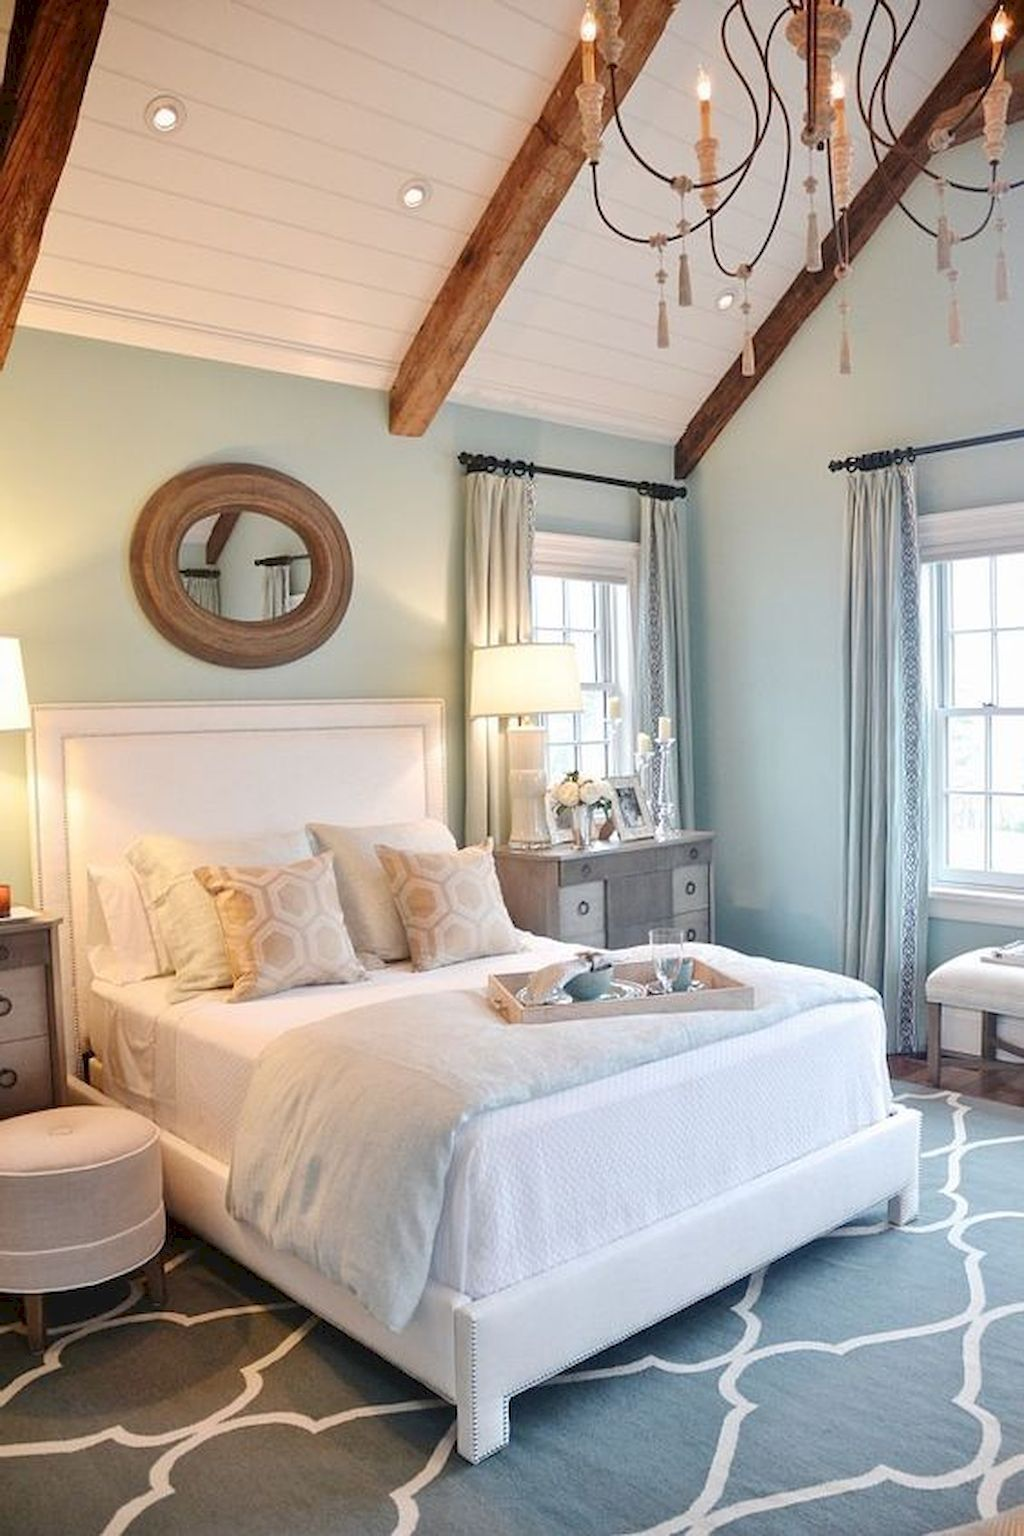 Awesome 55 Rustic Coastal Master Bedroom Ideas